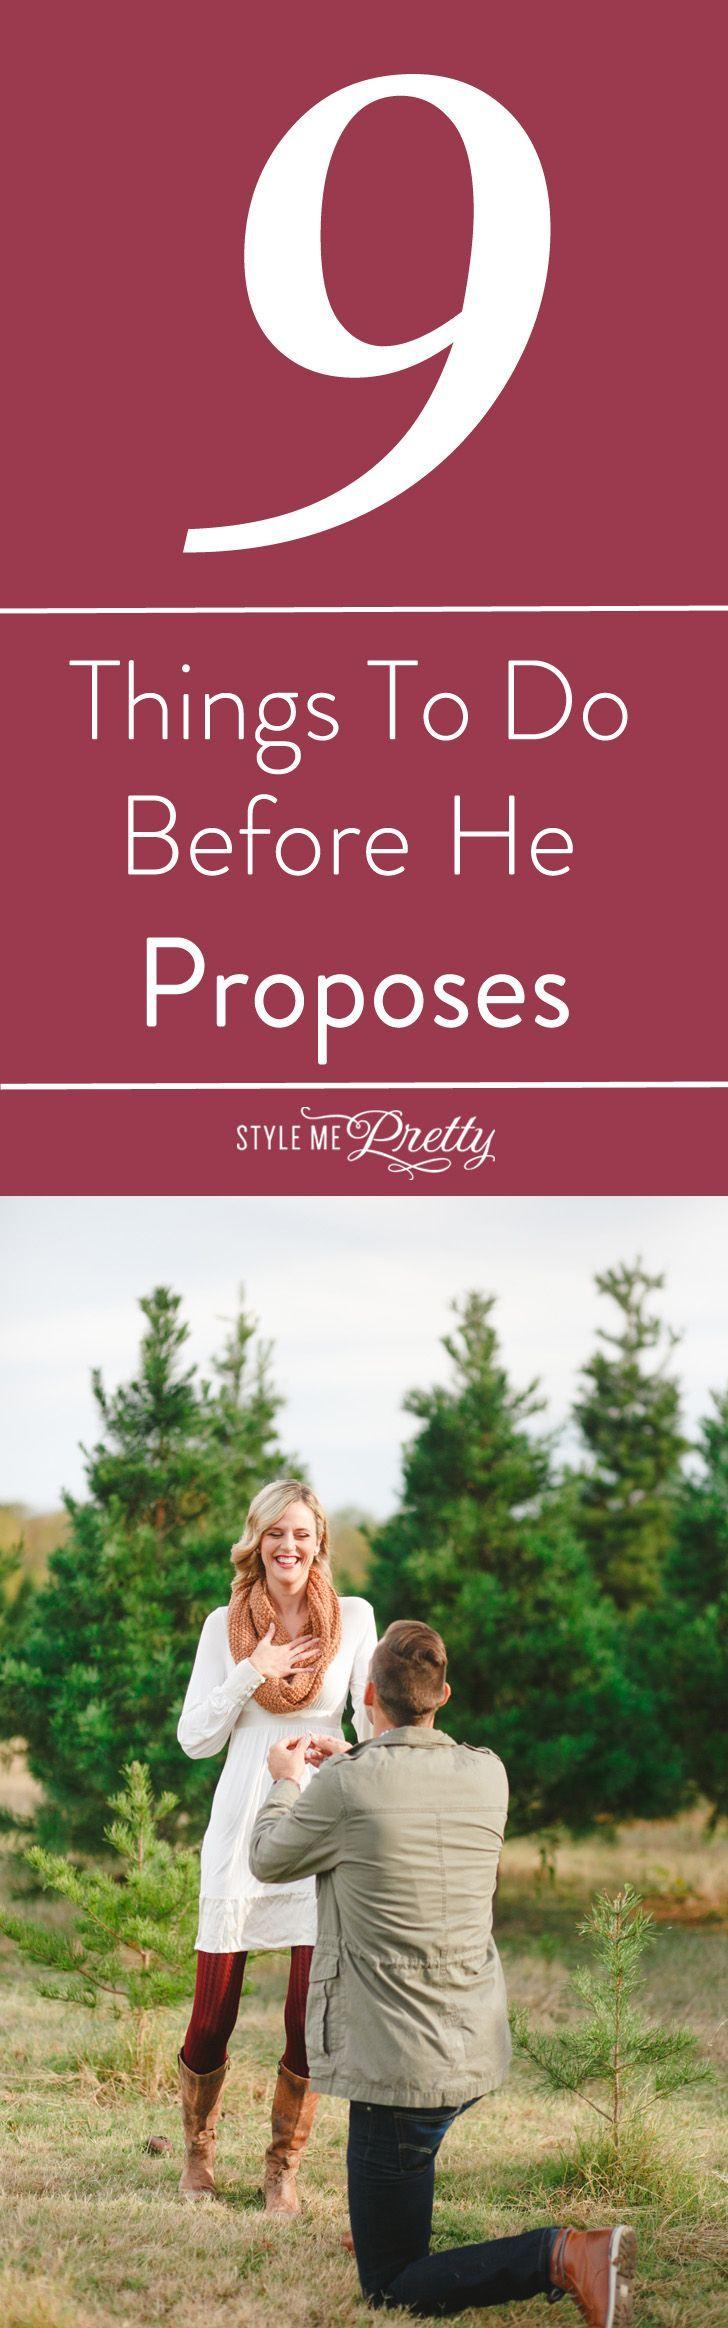 344 best Weddings images on Pinterest | Weddings, Planning a wedding ...